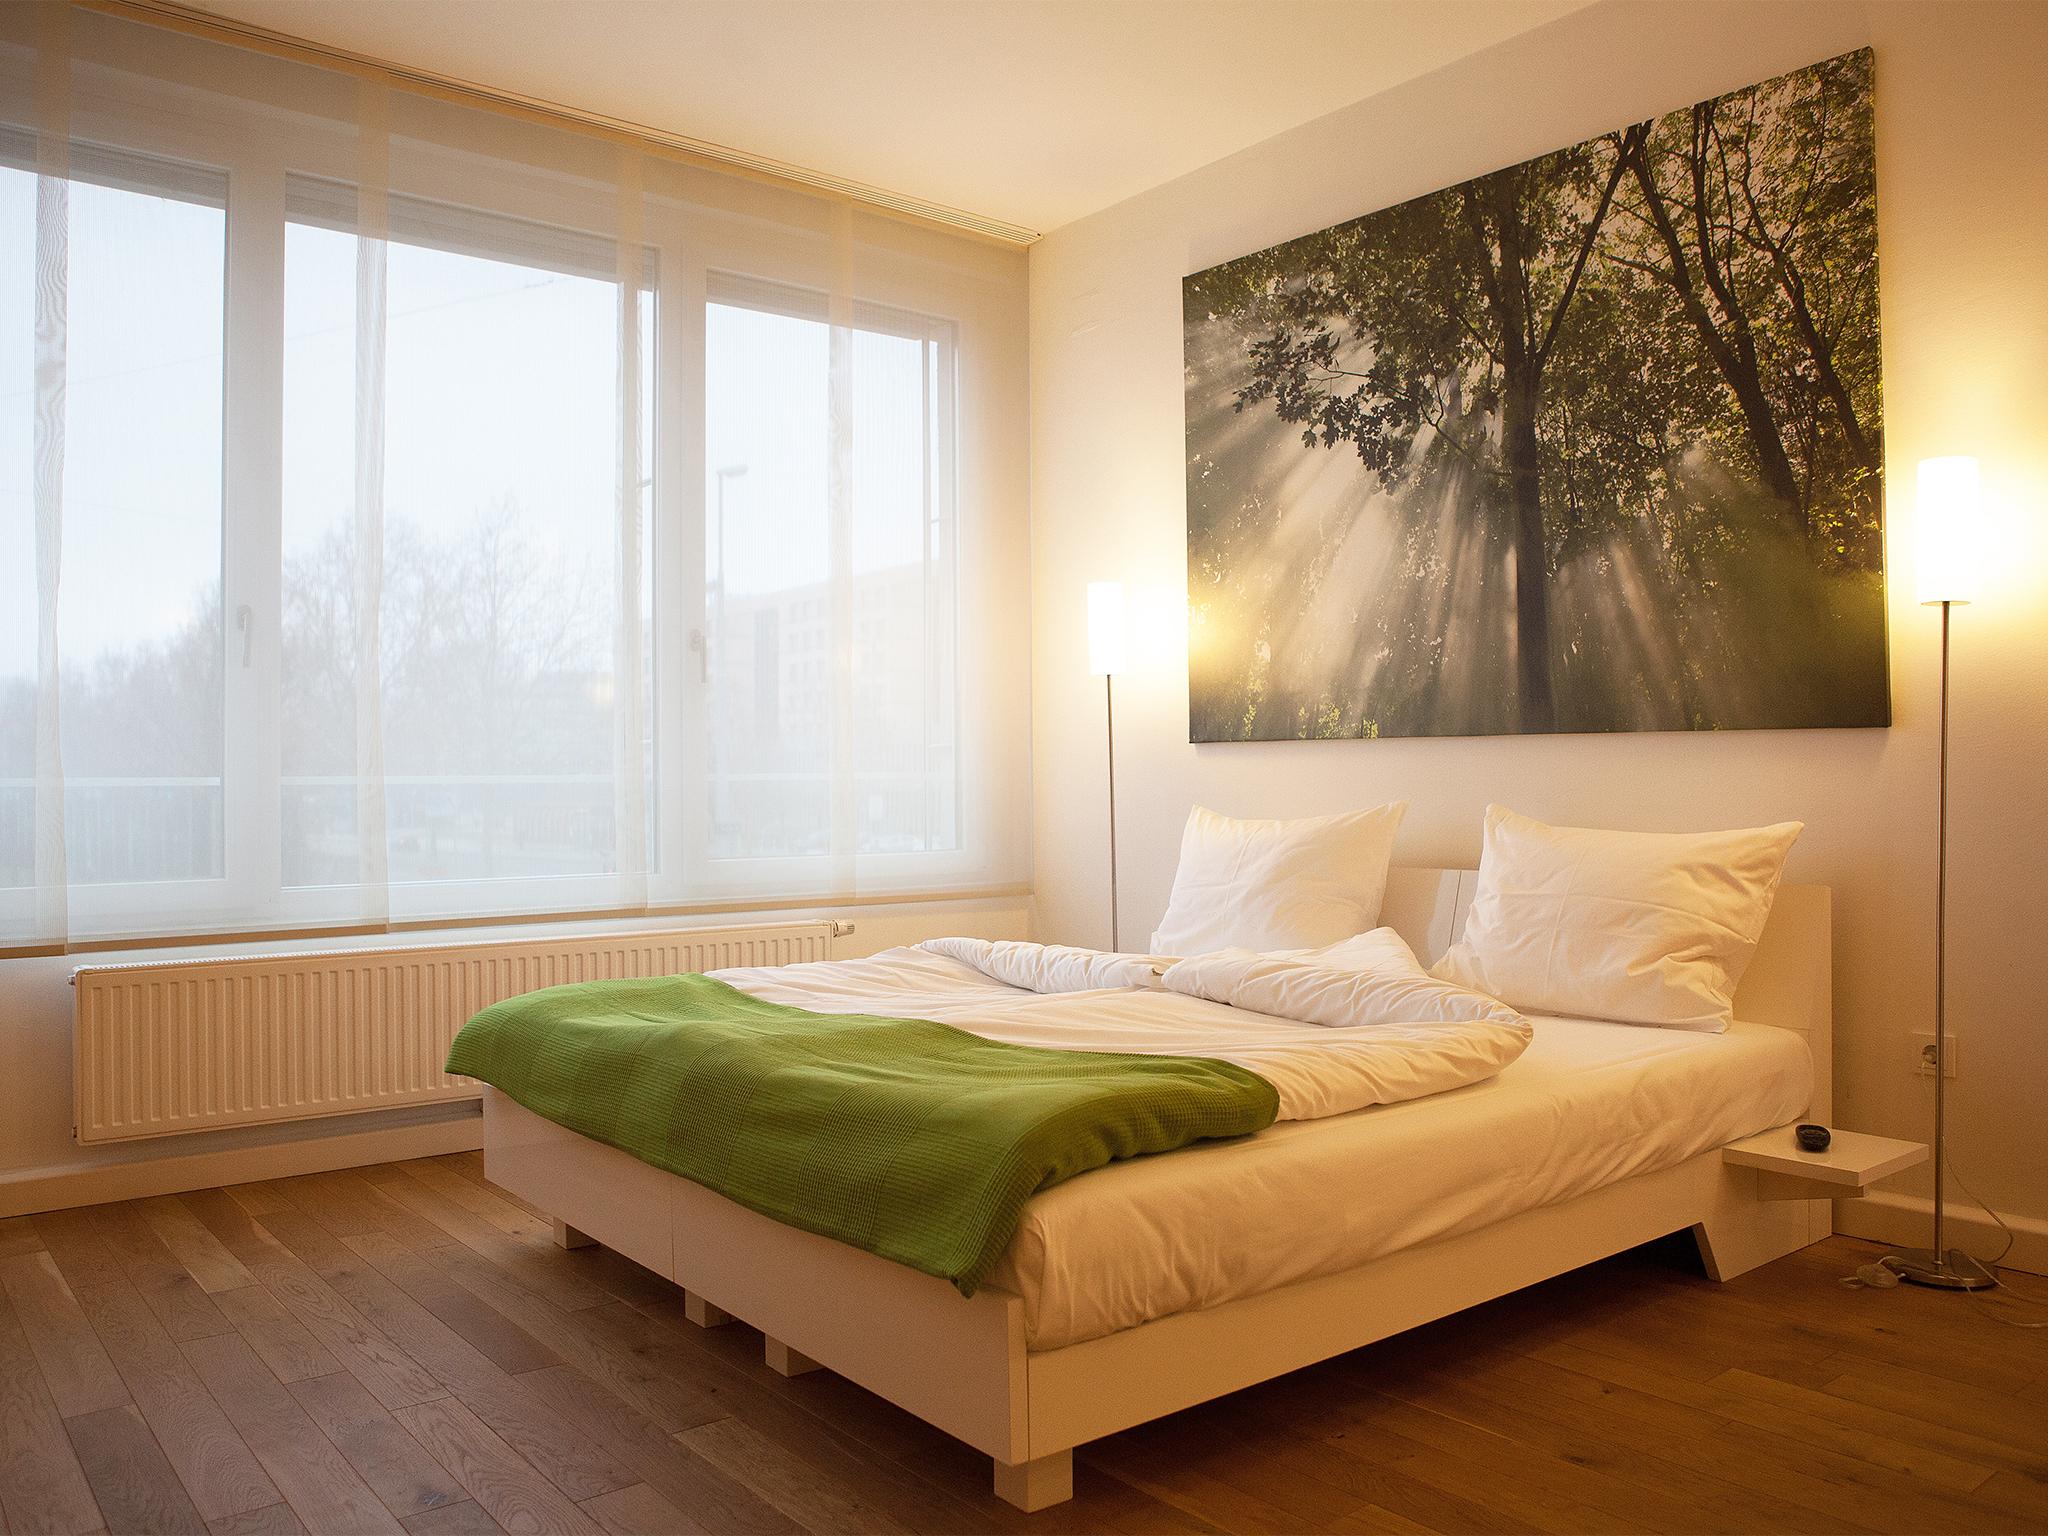 Apartment Erde Wohnraum Bett Detail